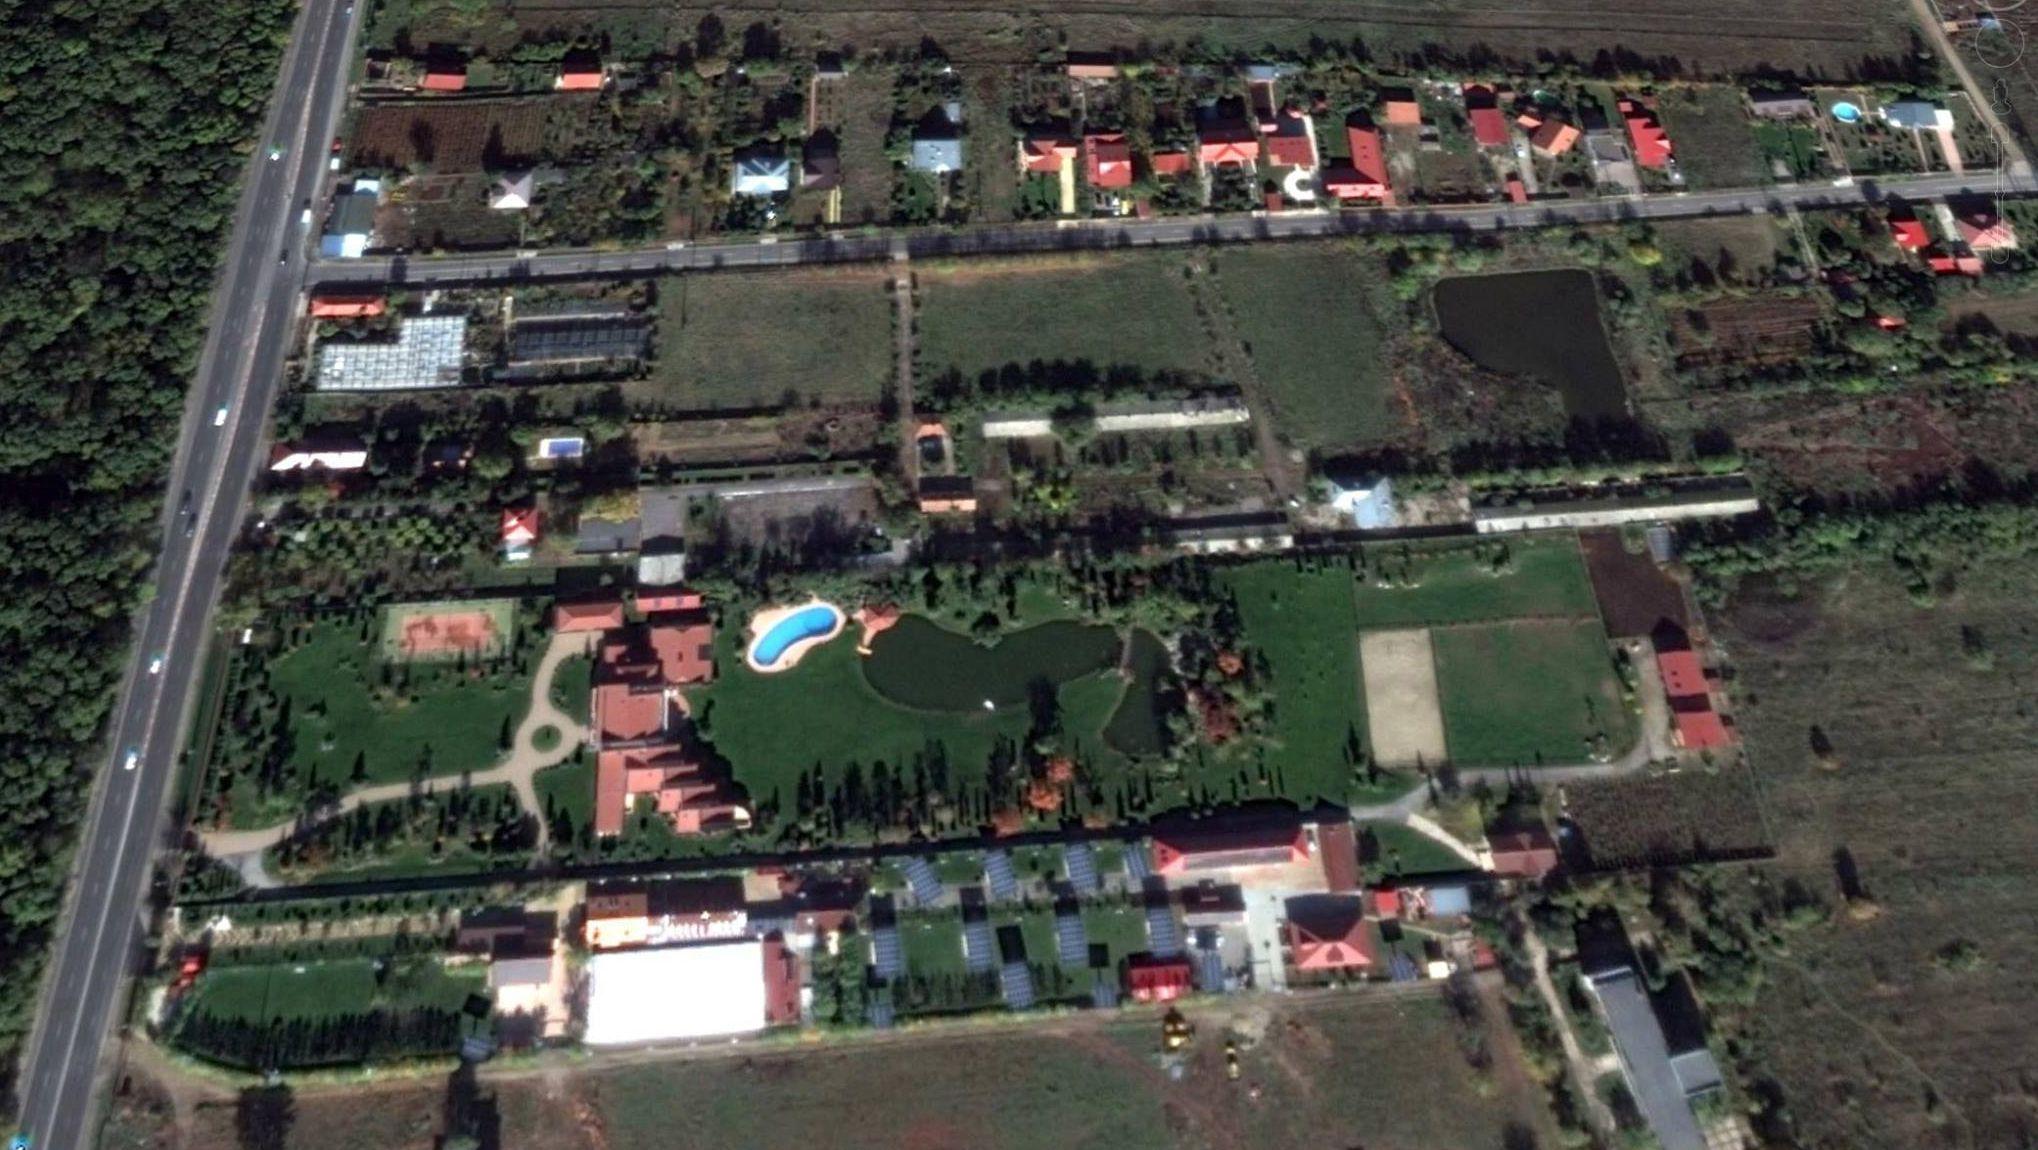 adelaparvu.com despre gradina amenjata de arh Dragos Isacescu, Foto Google Earth 1 (5)